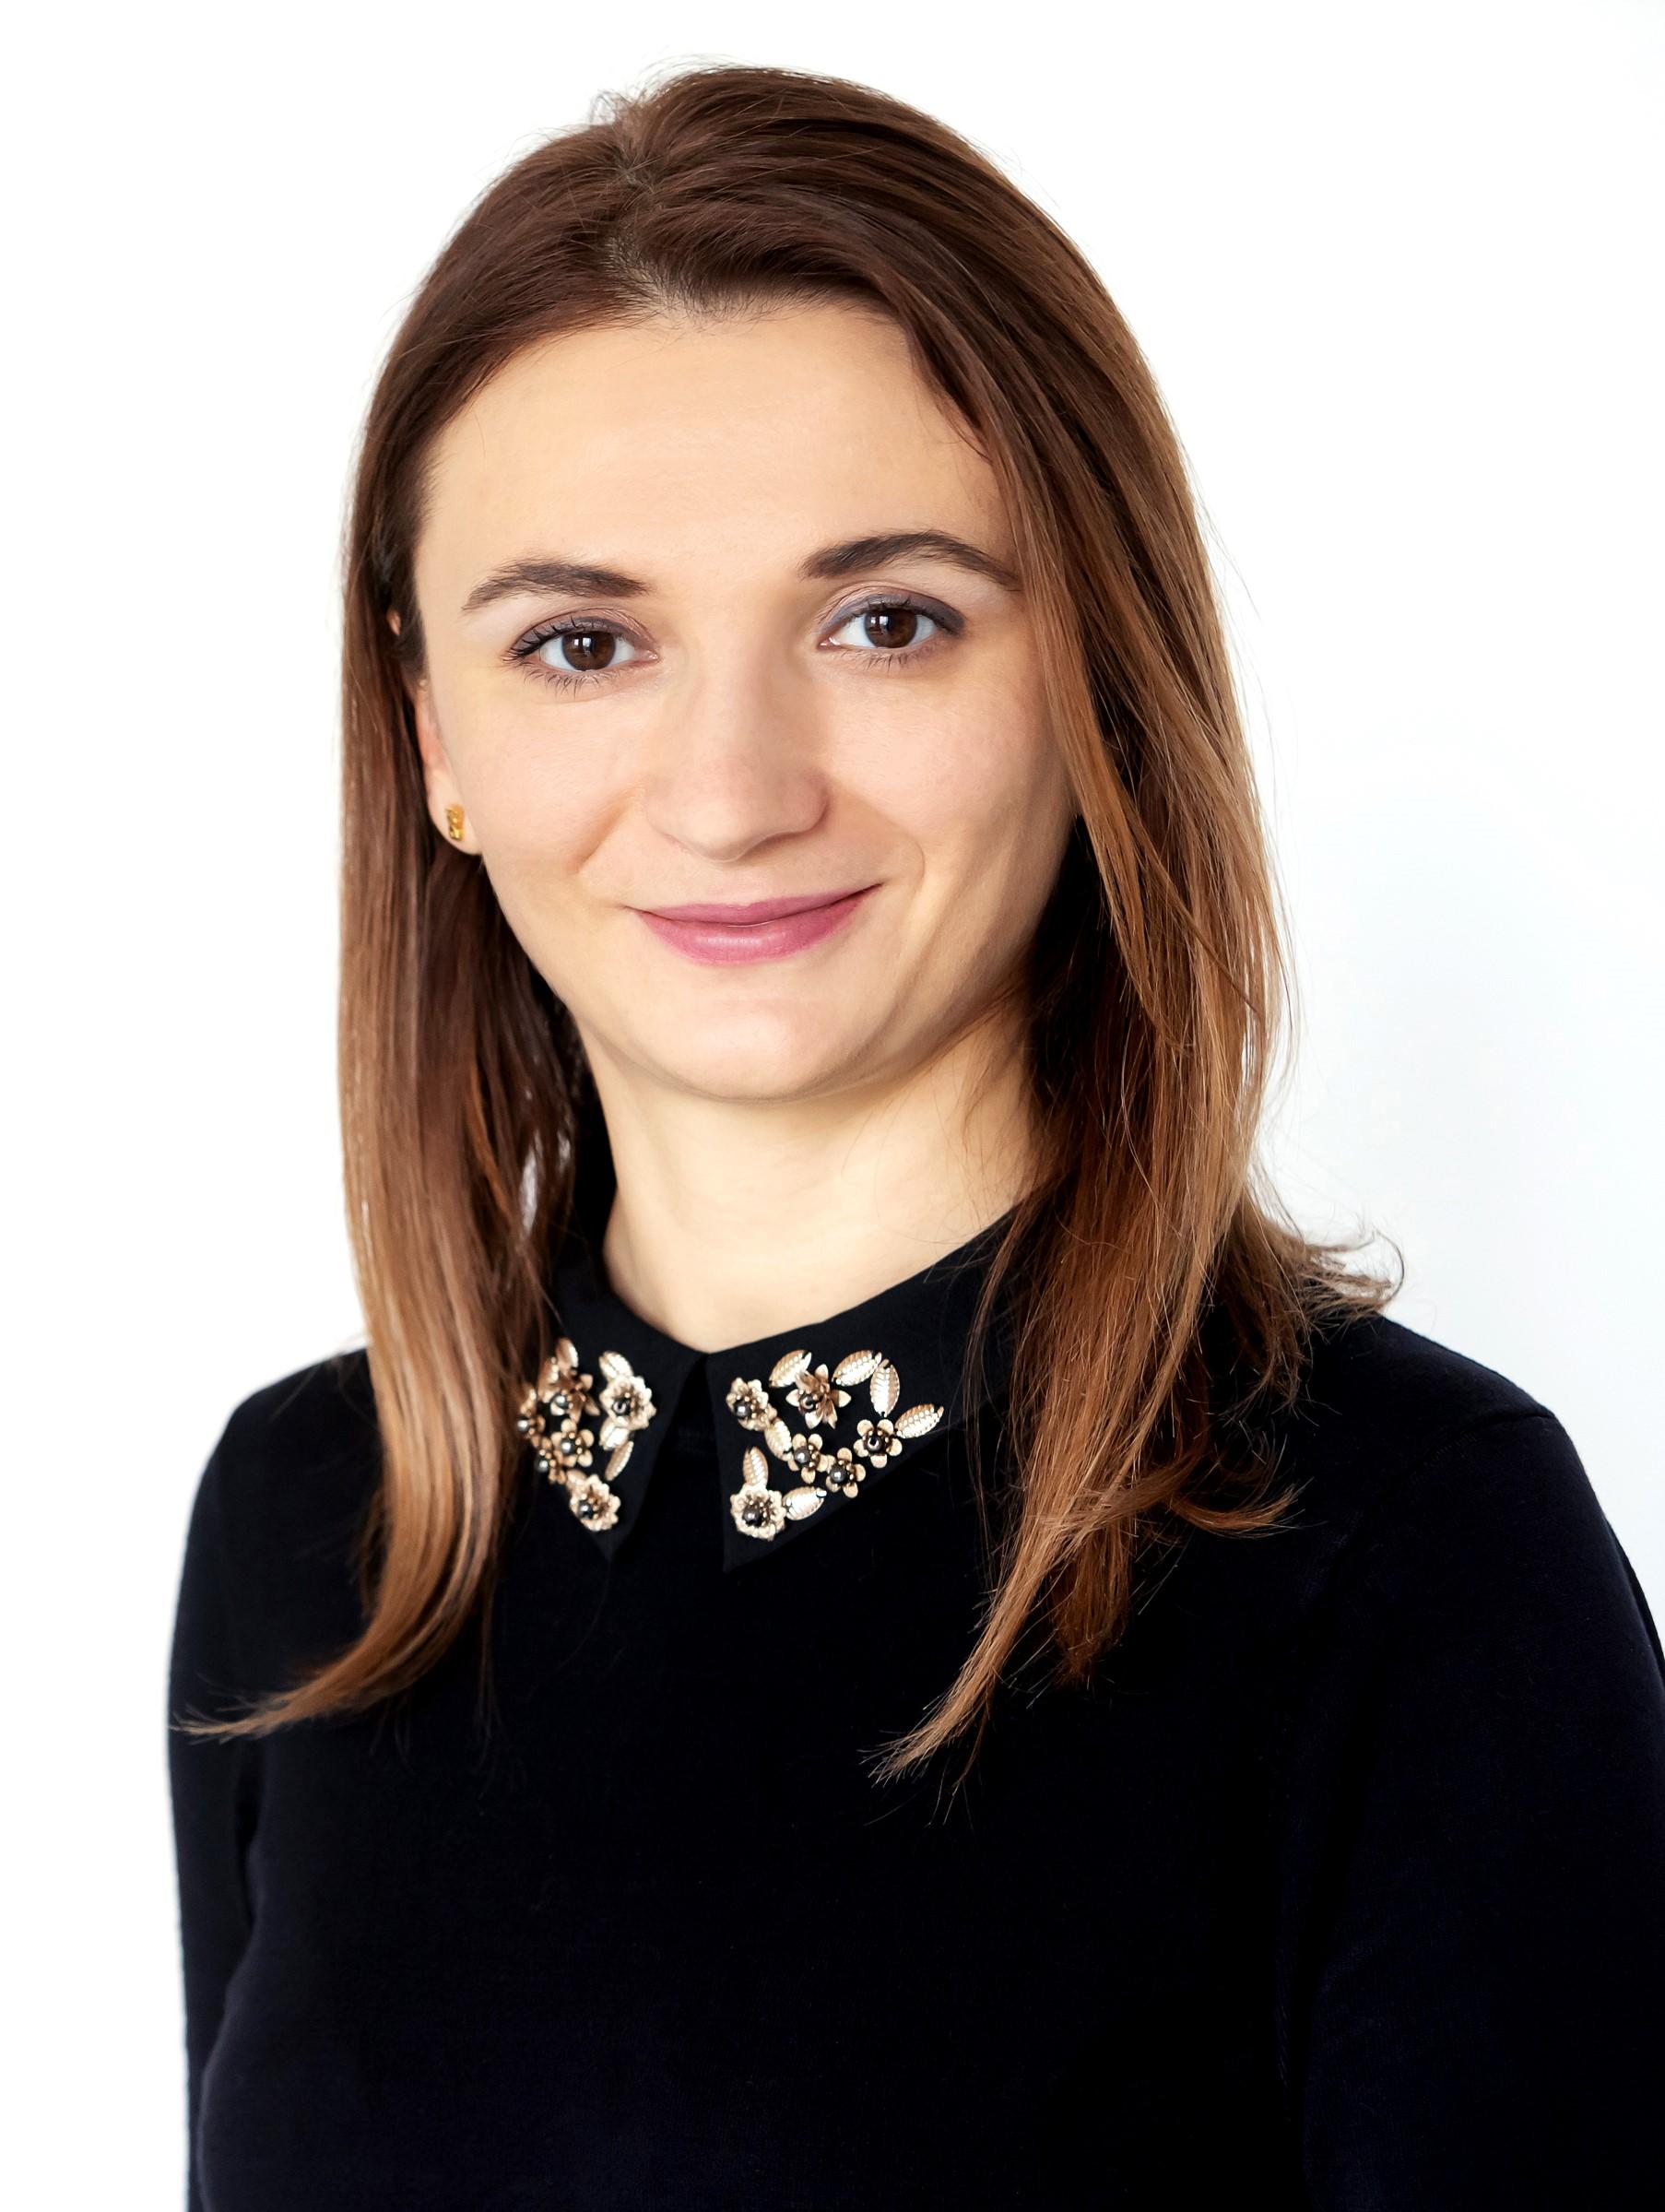 Mihaela Pašek-Virlan